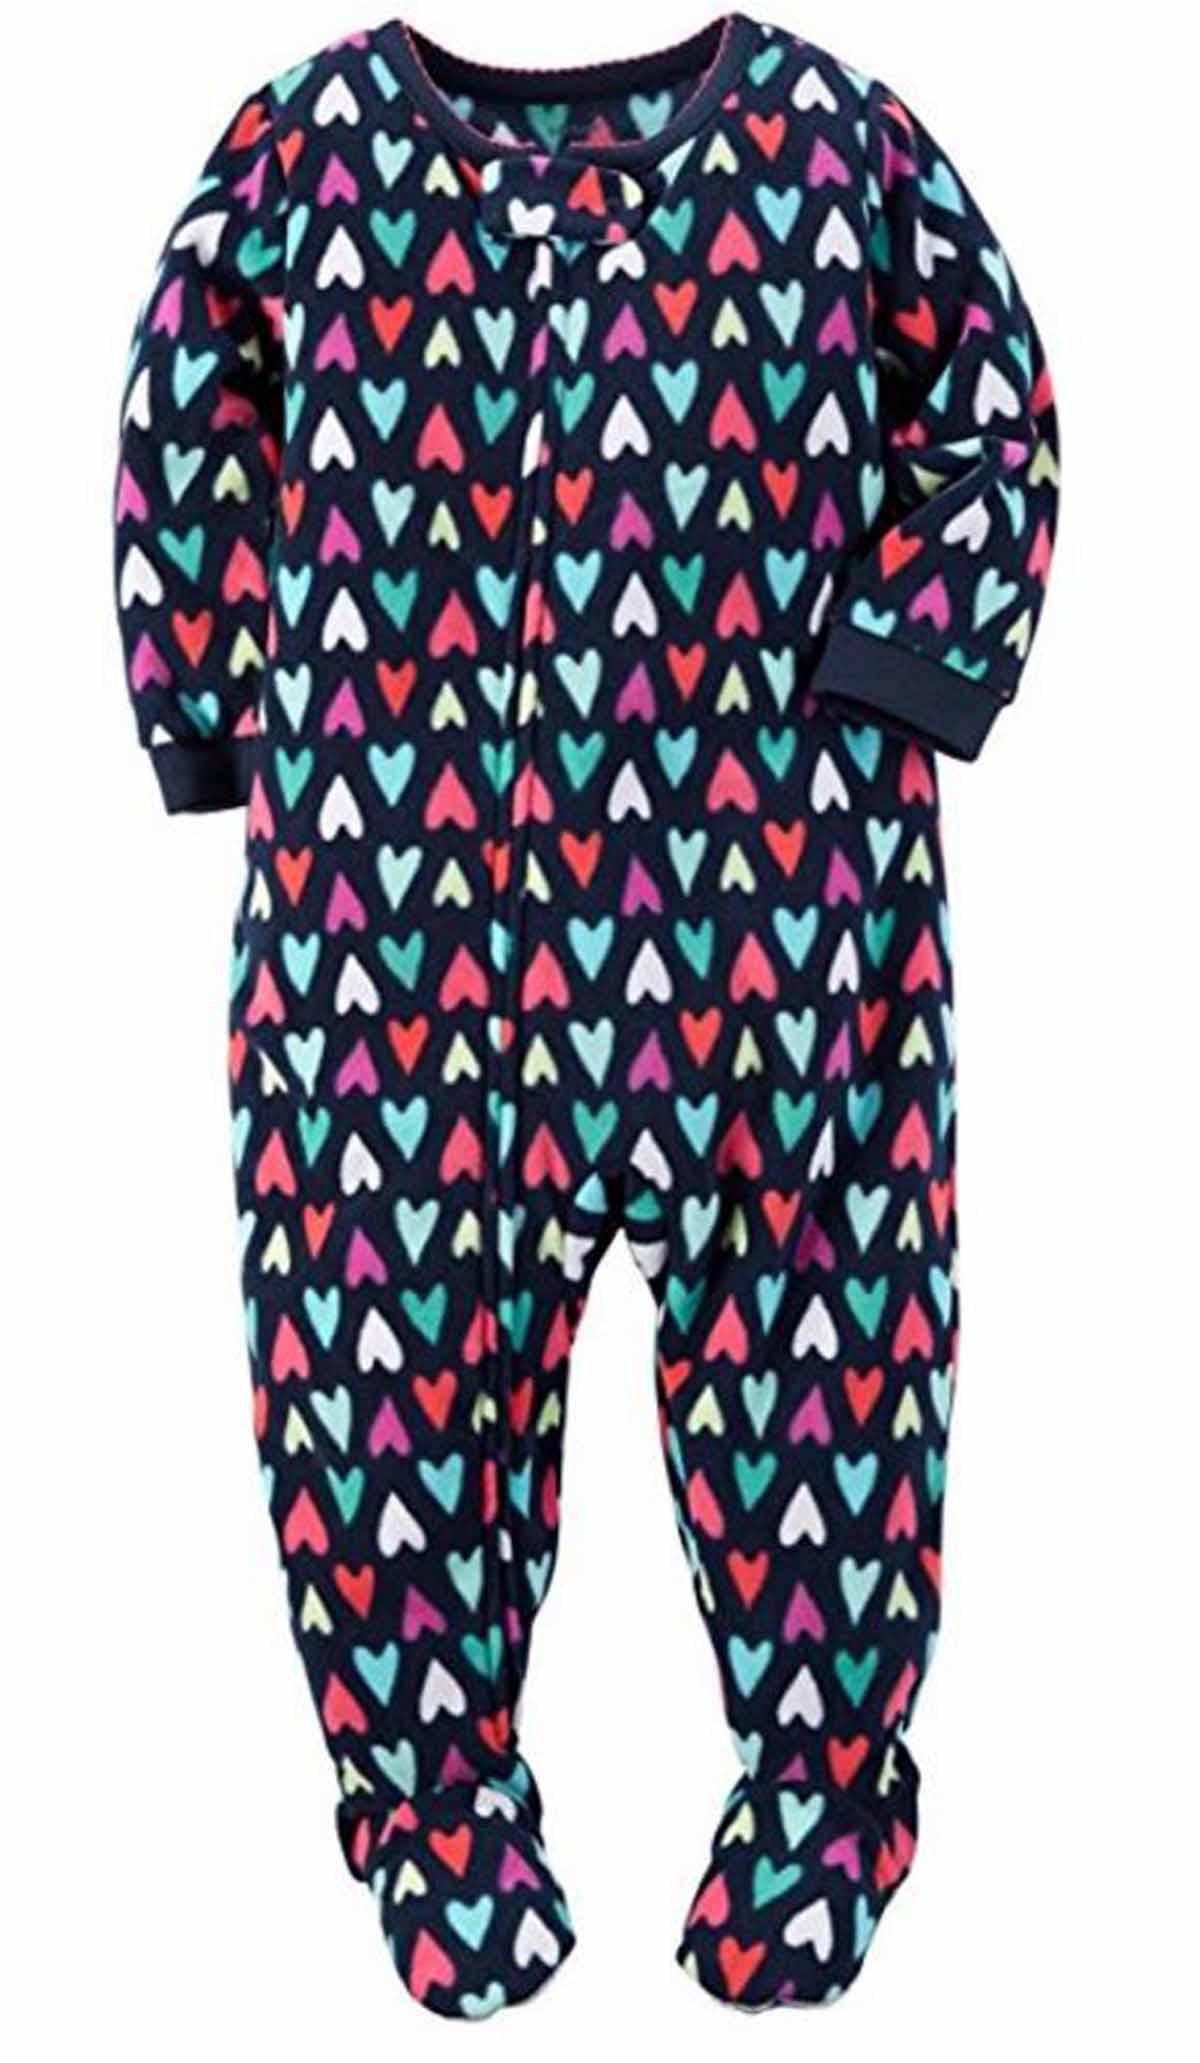 2a832f5f7 Carters Girls 1 Piece Footed Sleeper Zip Up Fleece Pajama